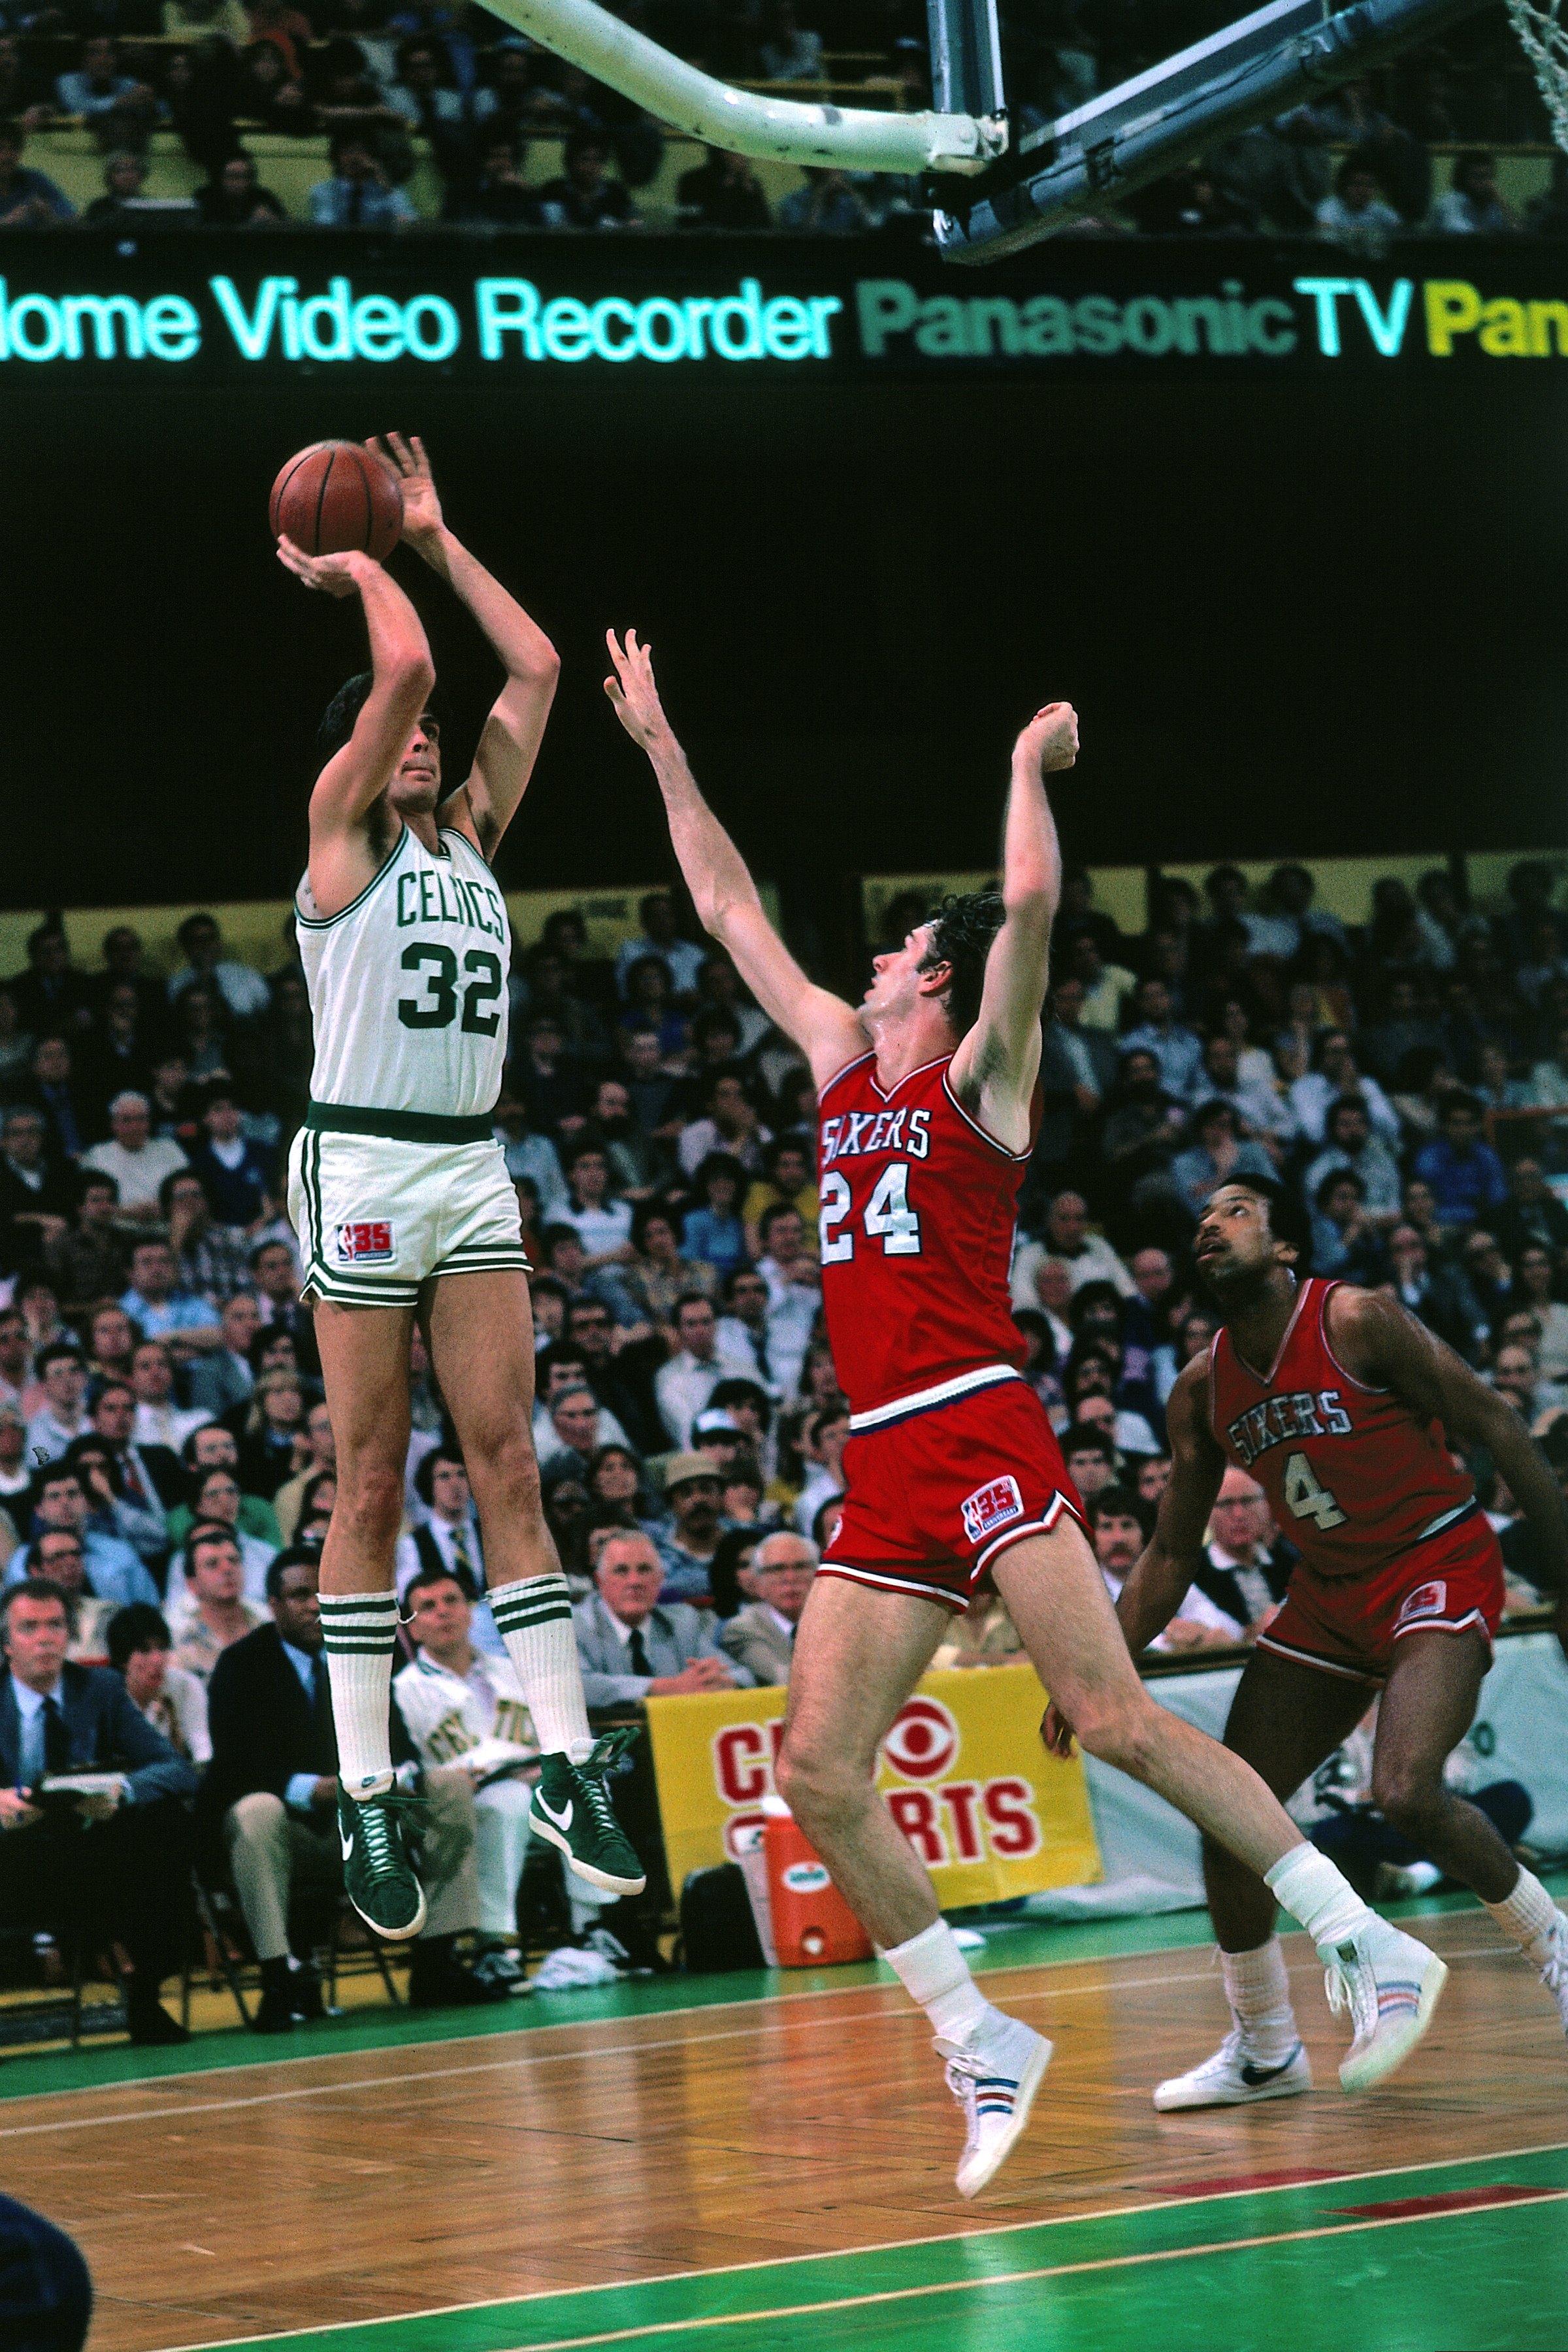 1981 Eastern Conference Finals Game 5: Philadelphia 76ers vs. Boston Celtics